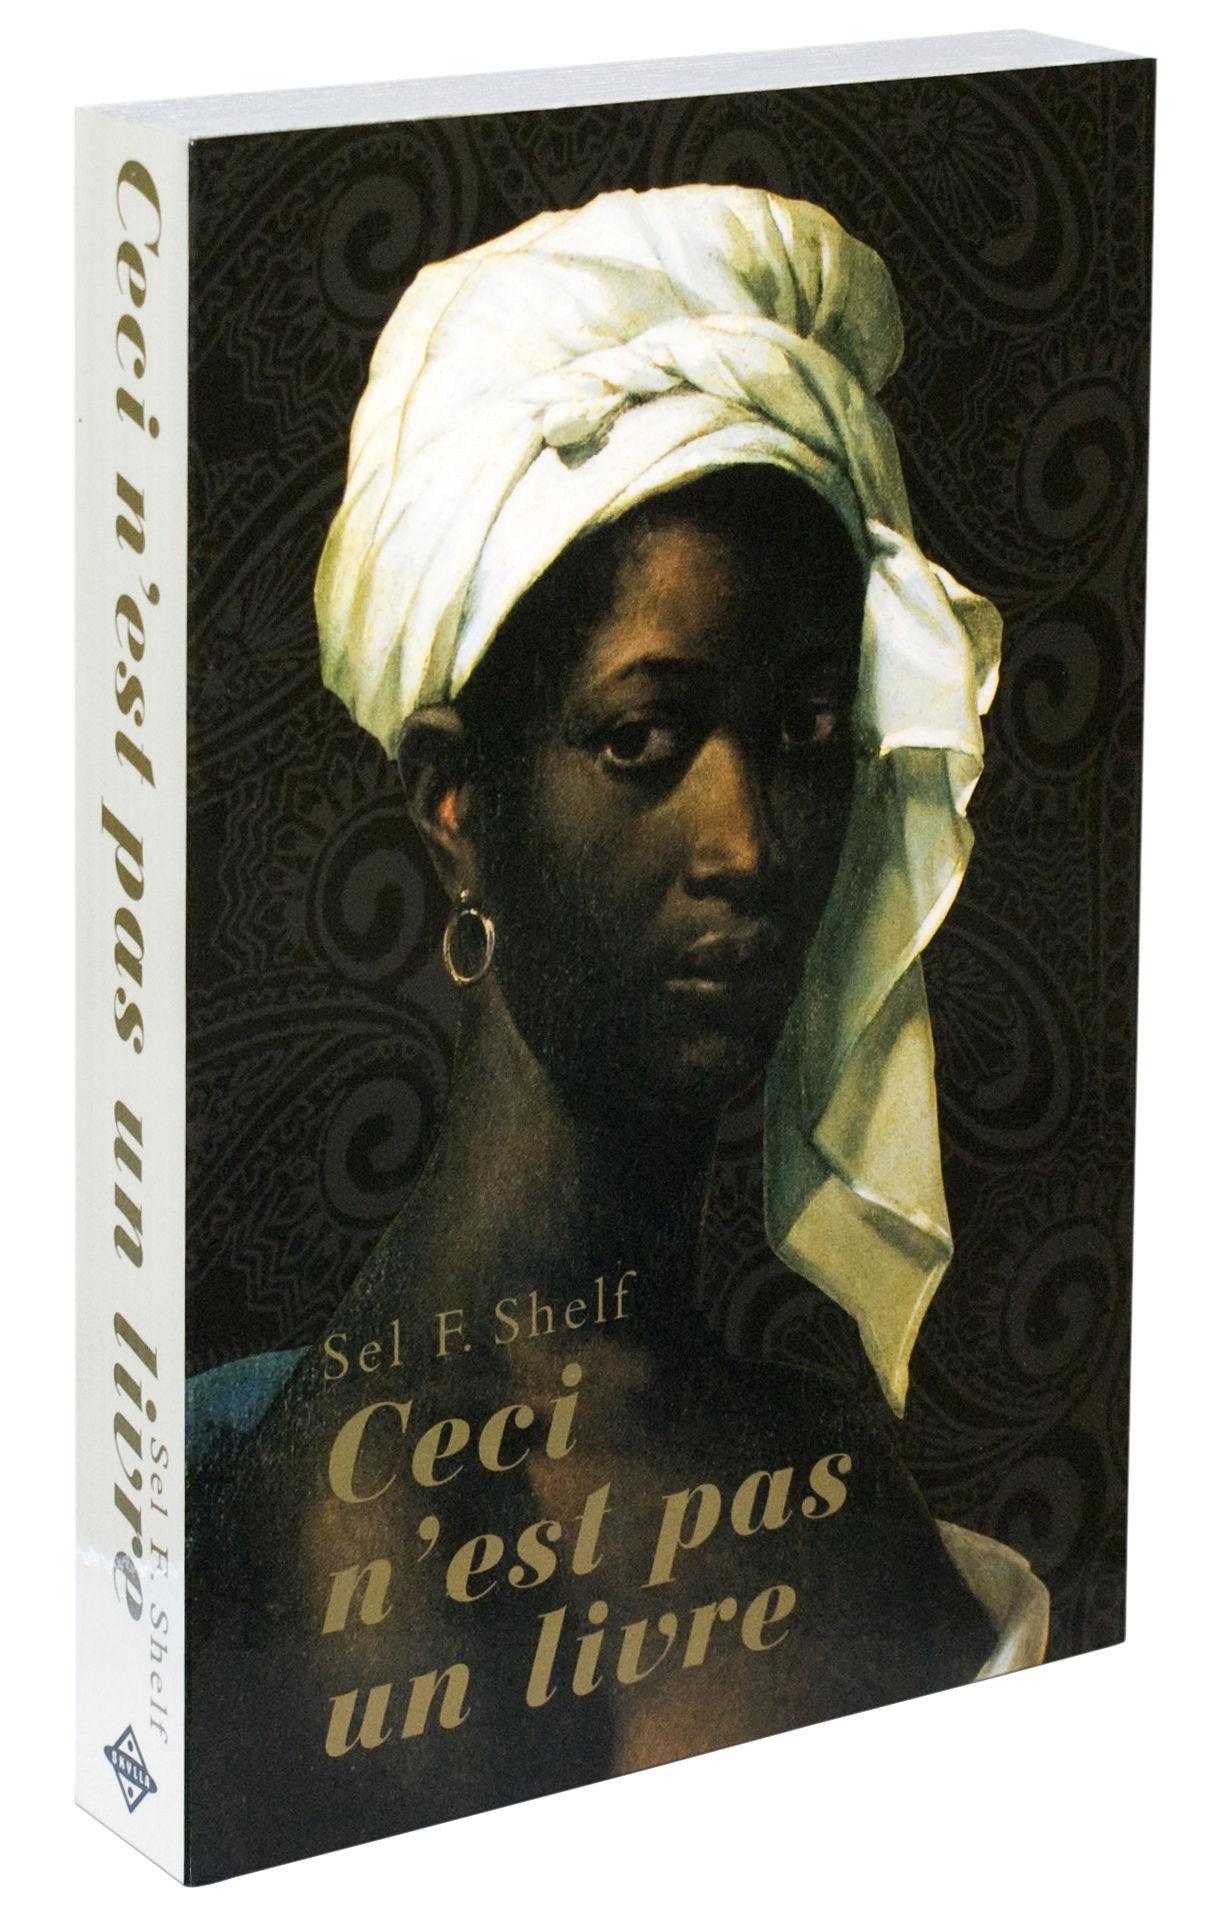 Furniture - Bookcases & Bookshelves - Self Shelf - Ceci n'est pas un livre Shelf - Optical illusion by Zho - Pop Corn - Woman / White turban - Painted wood